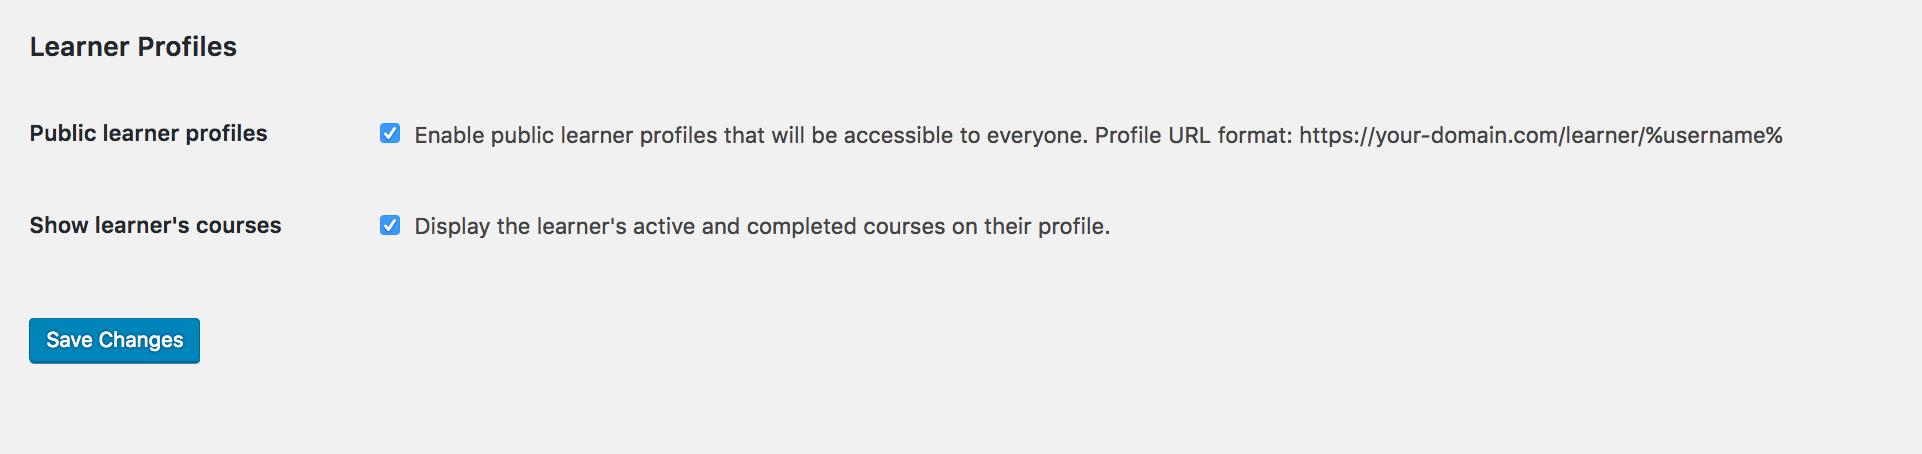 Sensei LMS Settings - Learner Profiles